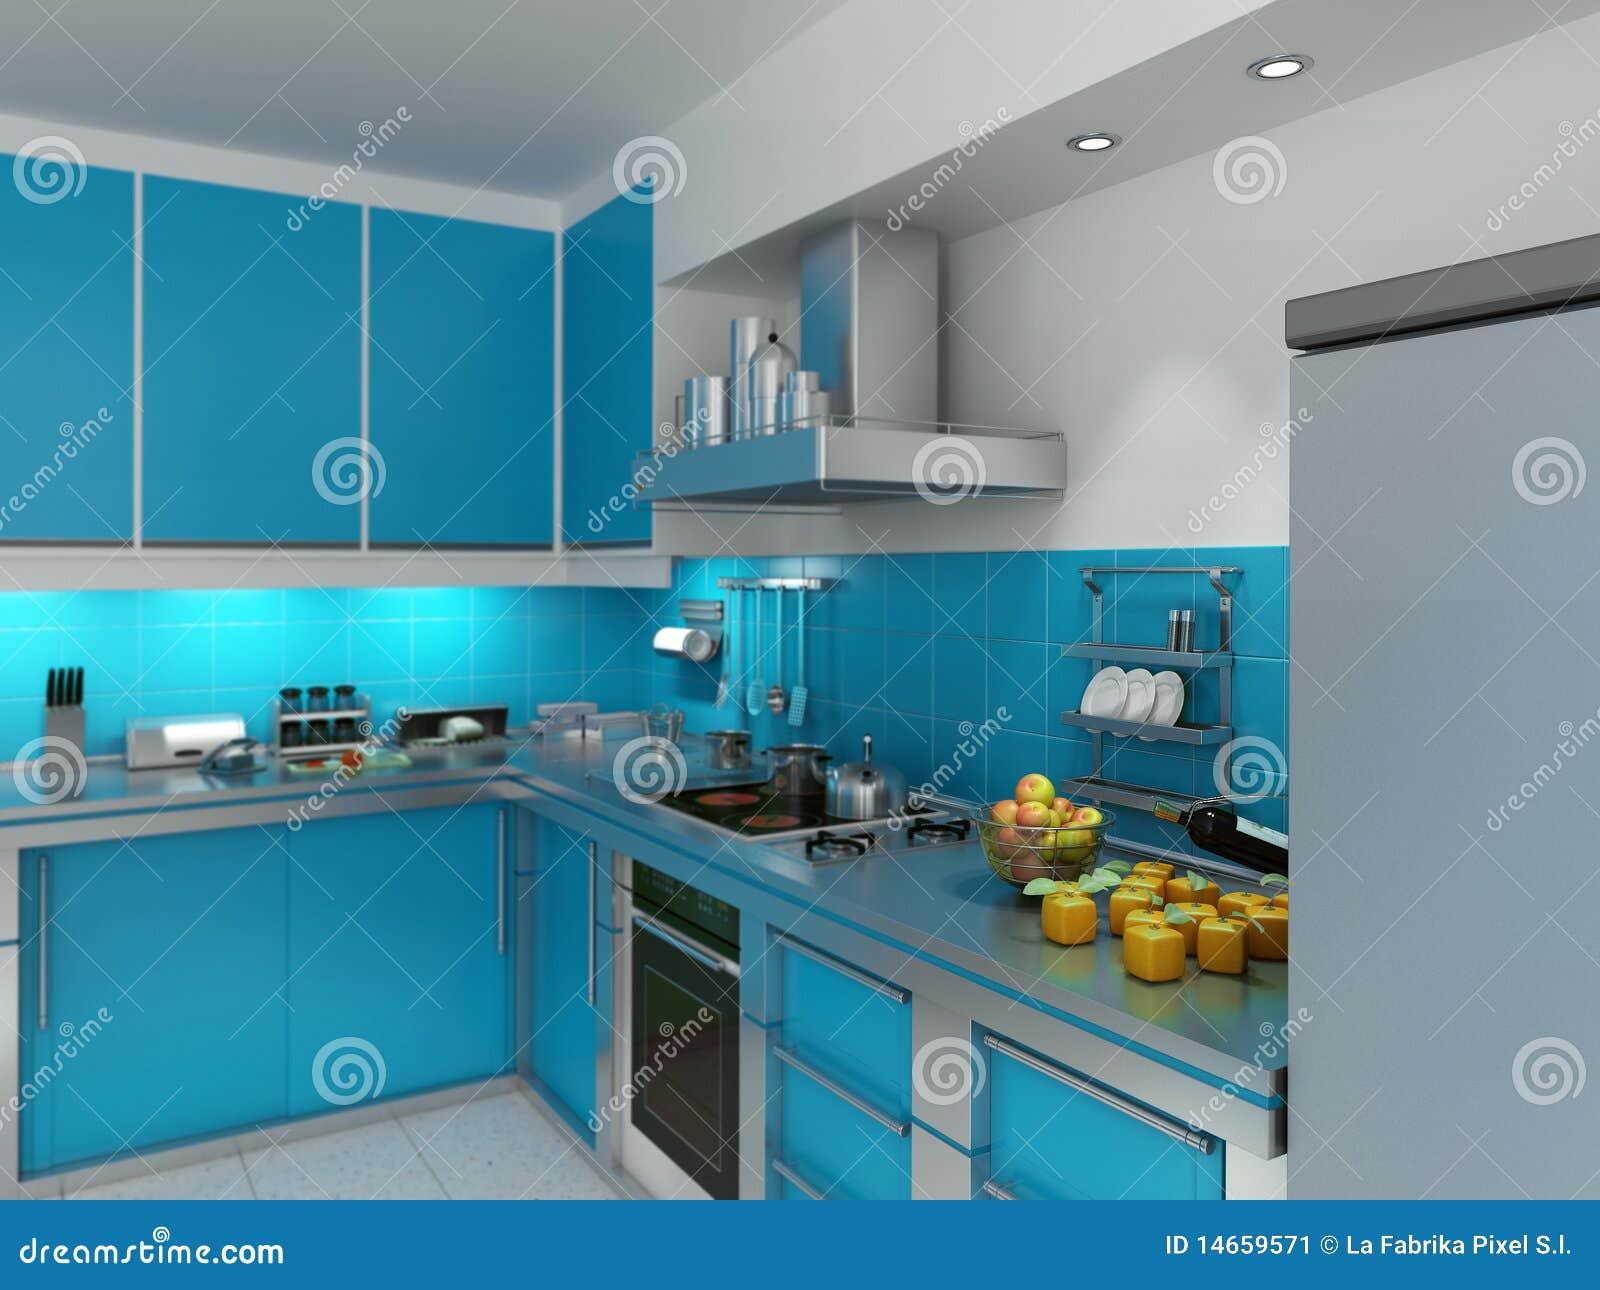 Turquoise kitchen stock illustration. Illustration of knives - 14659571